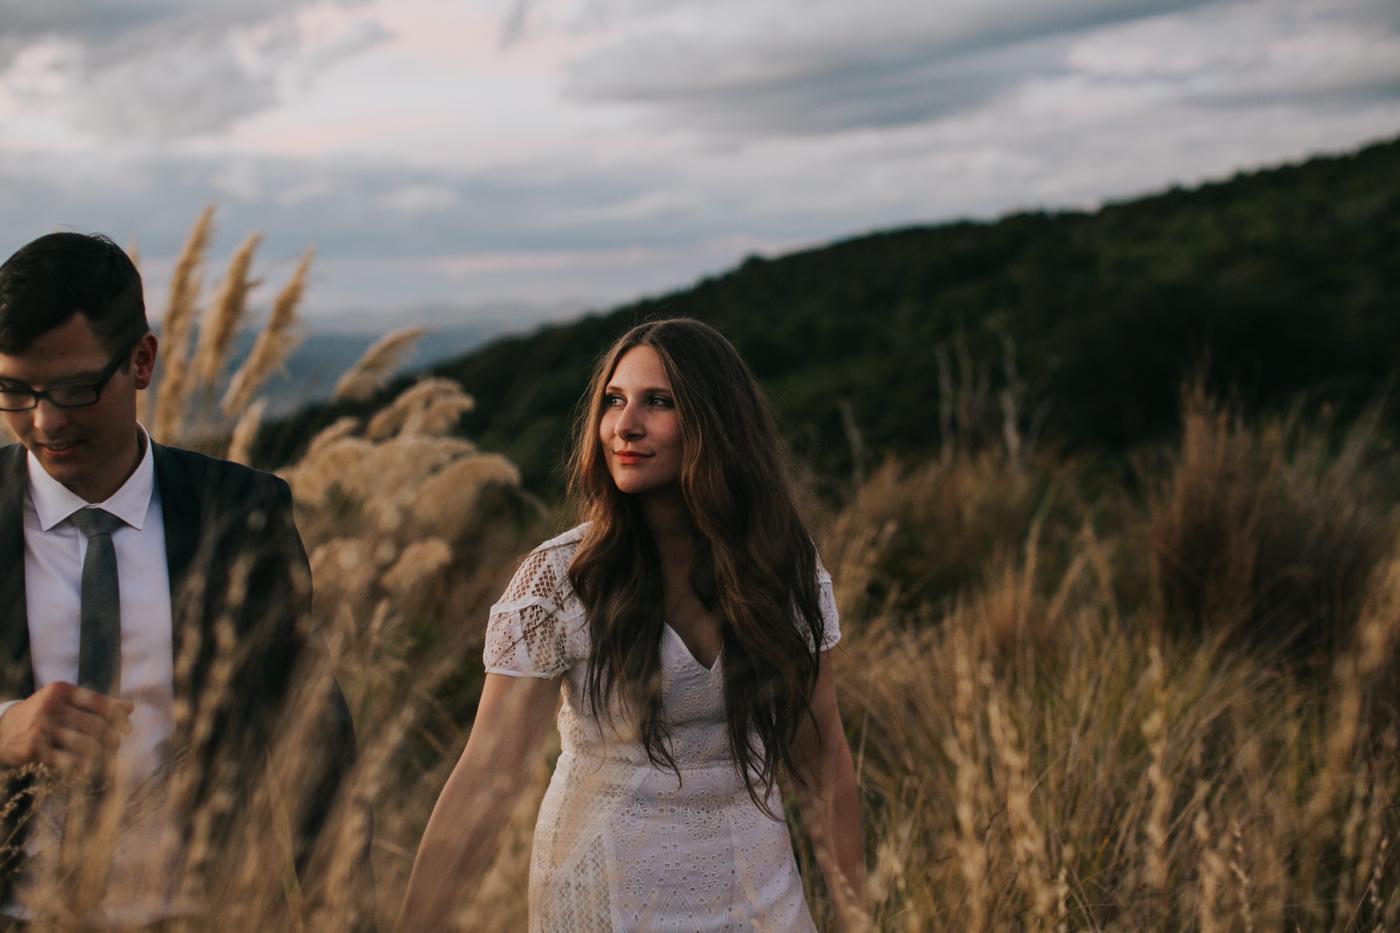 Ariana & Tim - Dunedin, New Zealand Wedding - Destination Wedding - Samantha Heather Photography-261.jpg